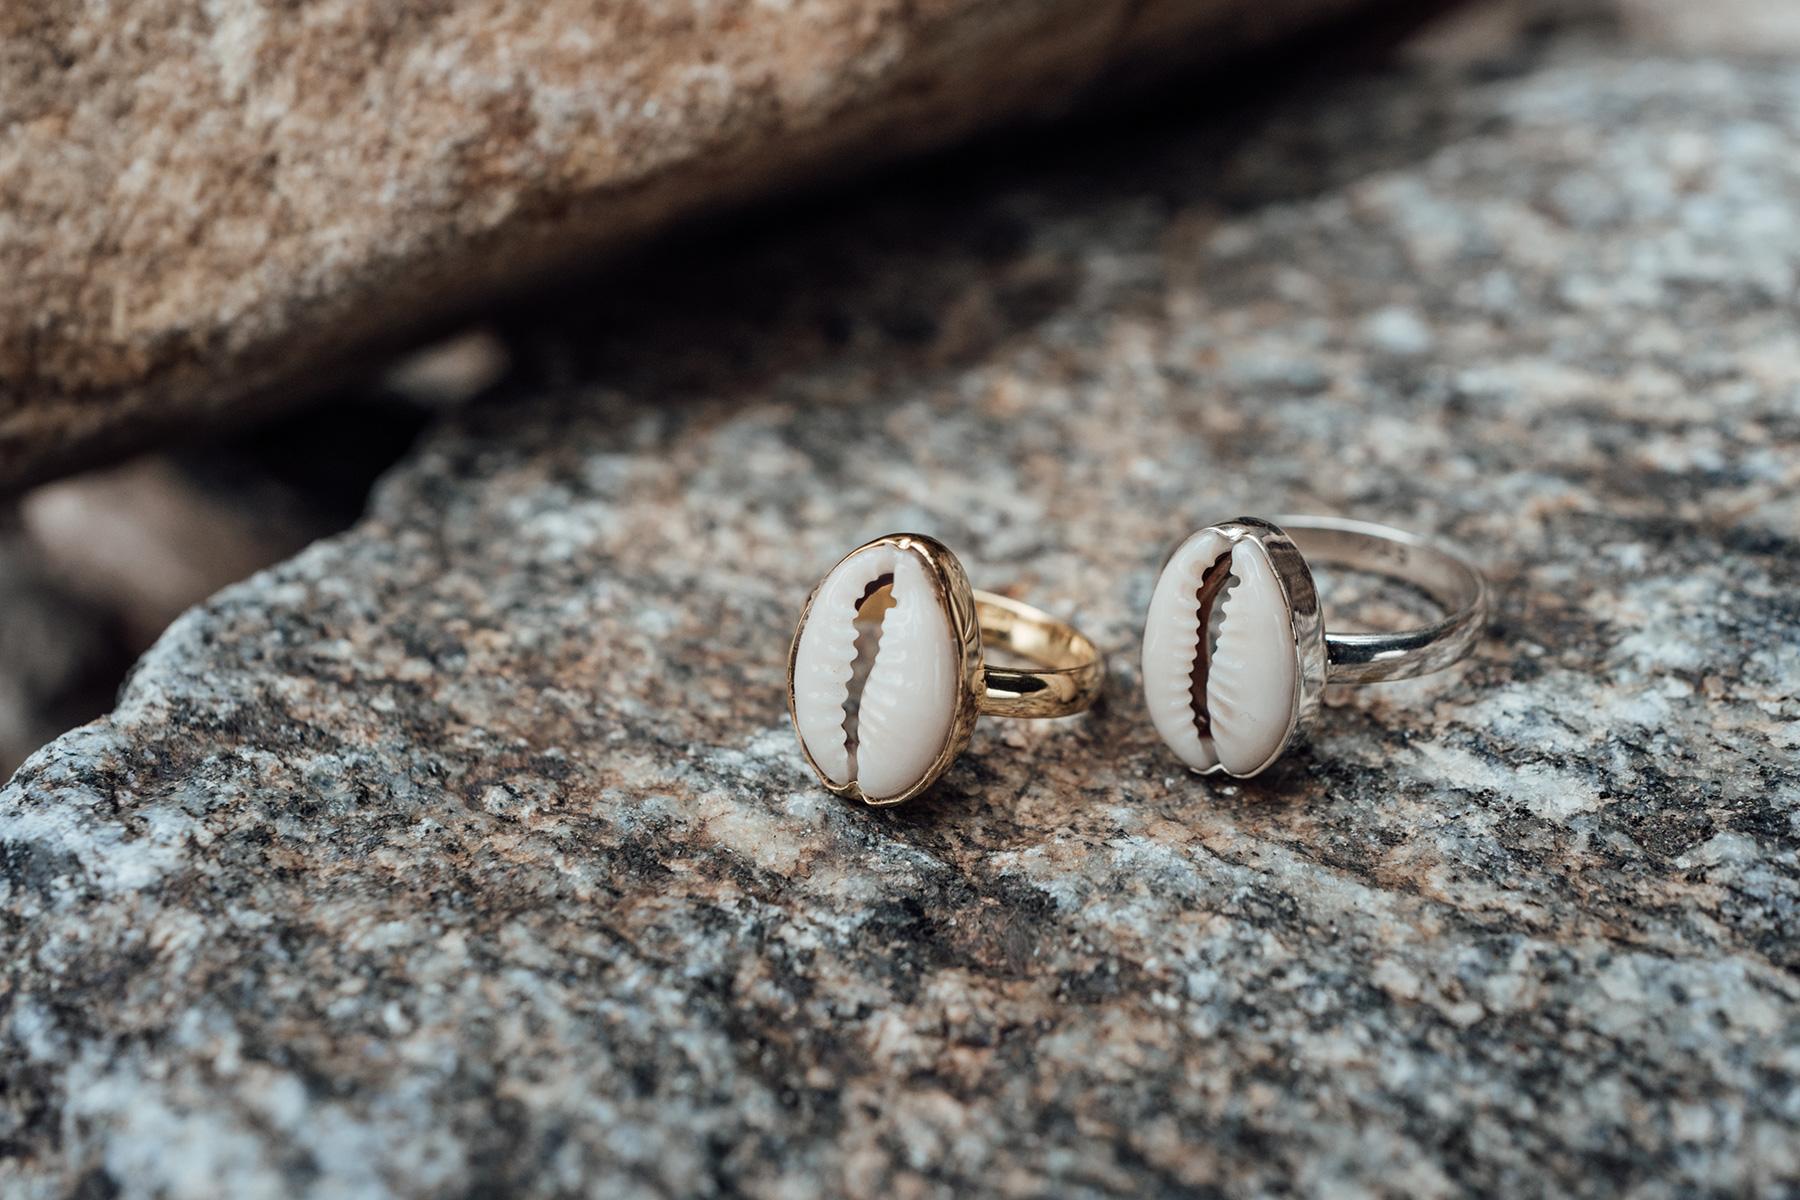 Geheimtipp Hamburg Produkt Travel Tales Jewelry Dahlina Sophie Kock 004